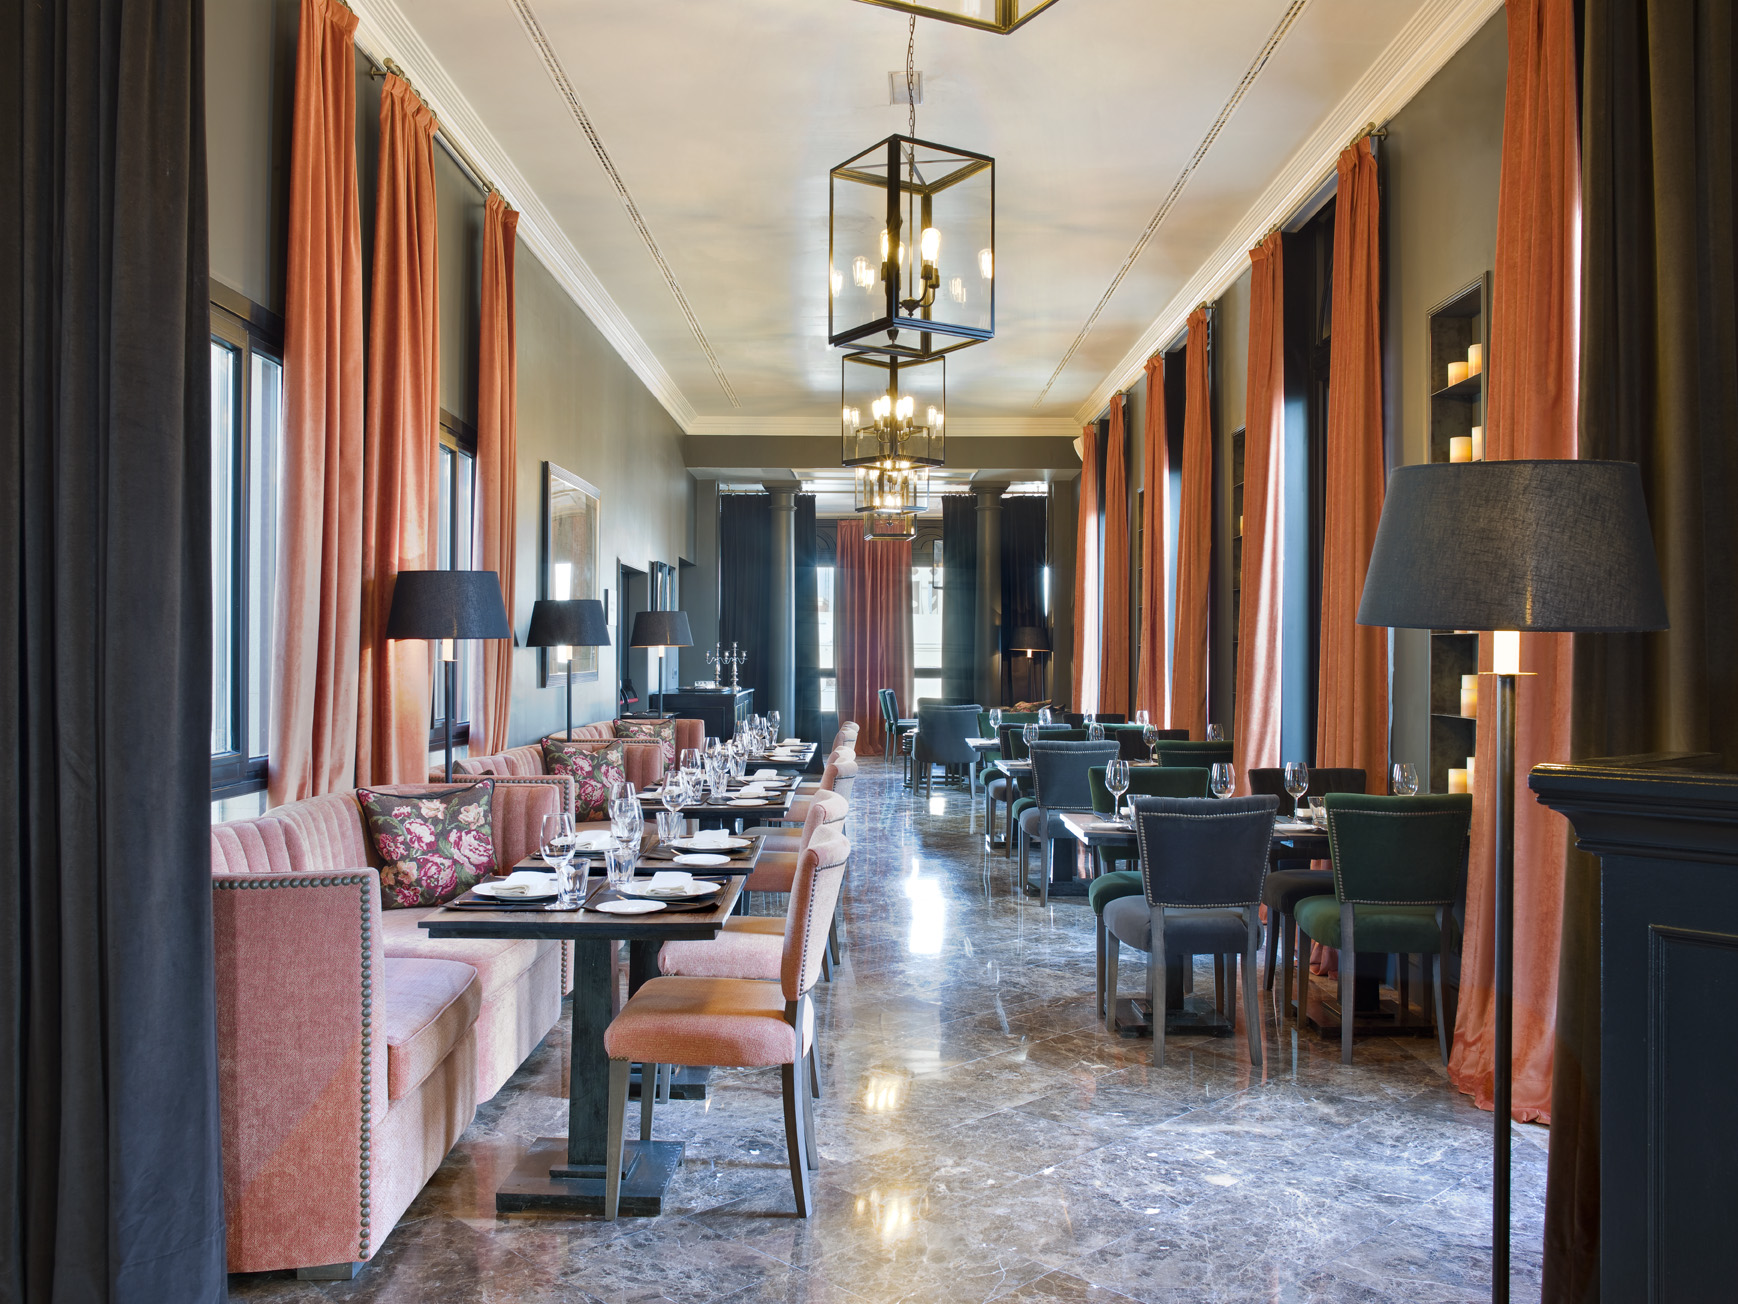 Ático by Ramon Freixa - The Principal Madrid Hotel